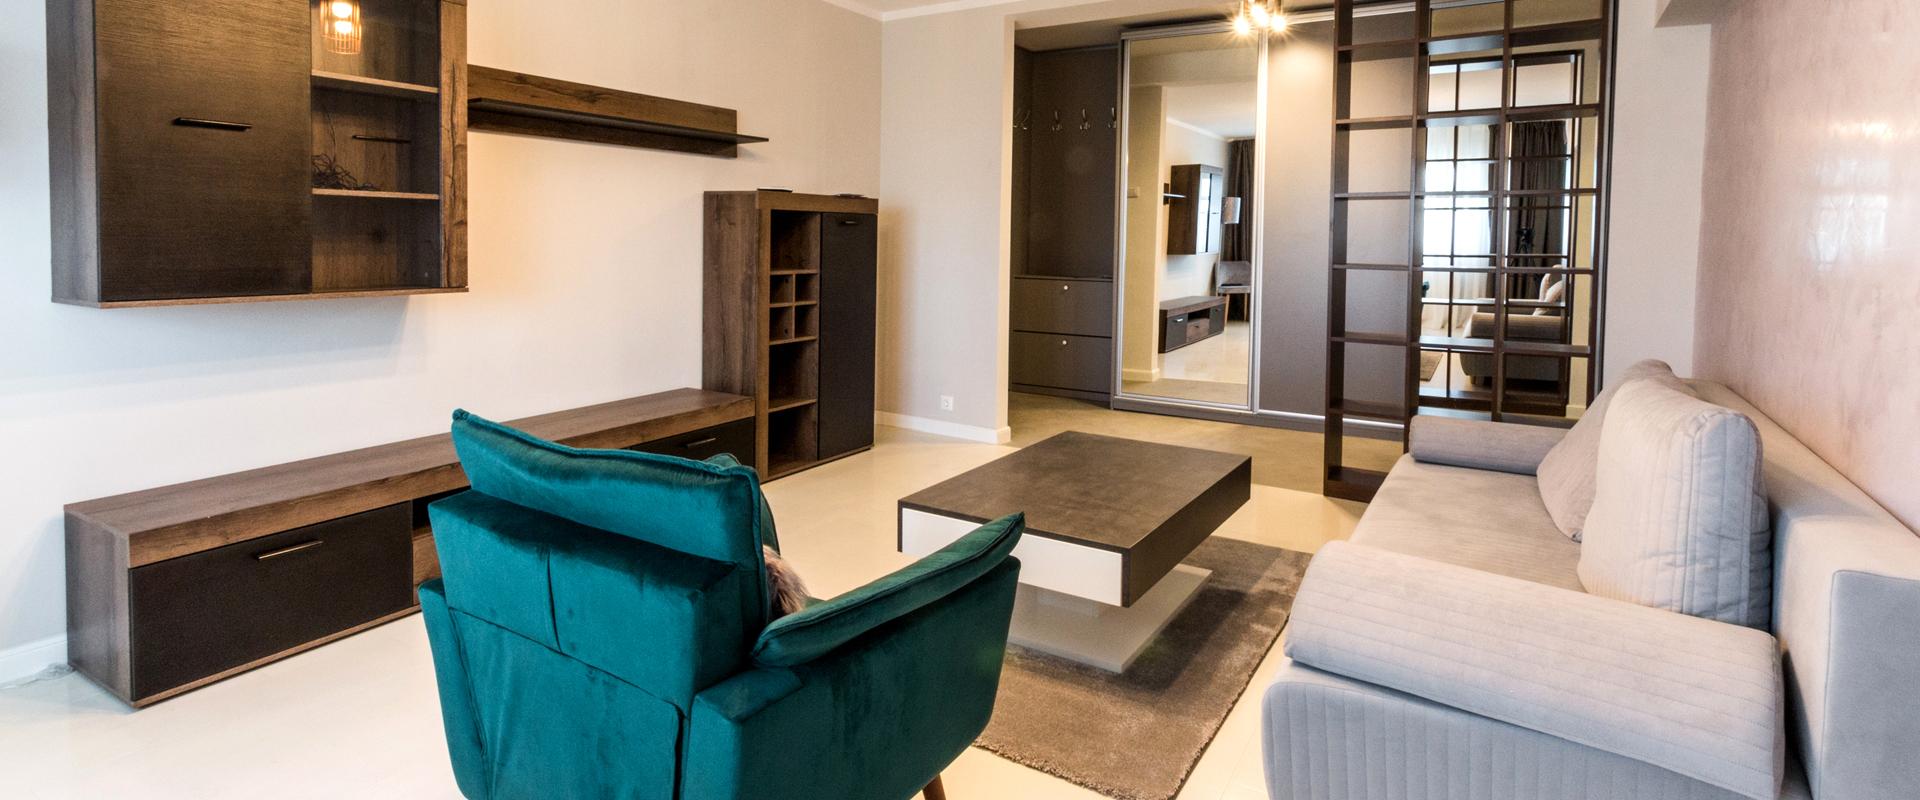 Vanzare apartament 2 camere   Premium, Renovat 2020, Mobilat, Metrou   Aviatiei [ID: 1038267 ]